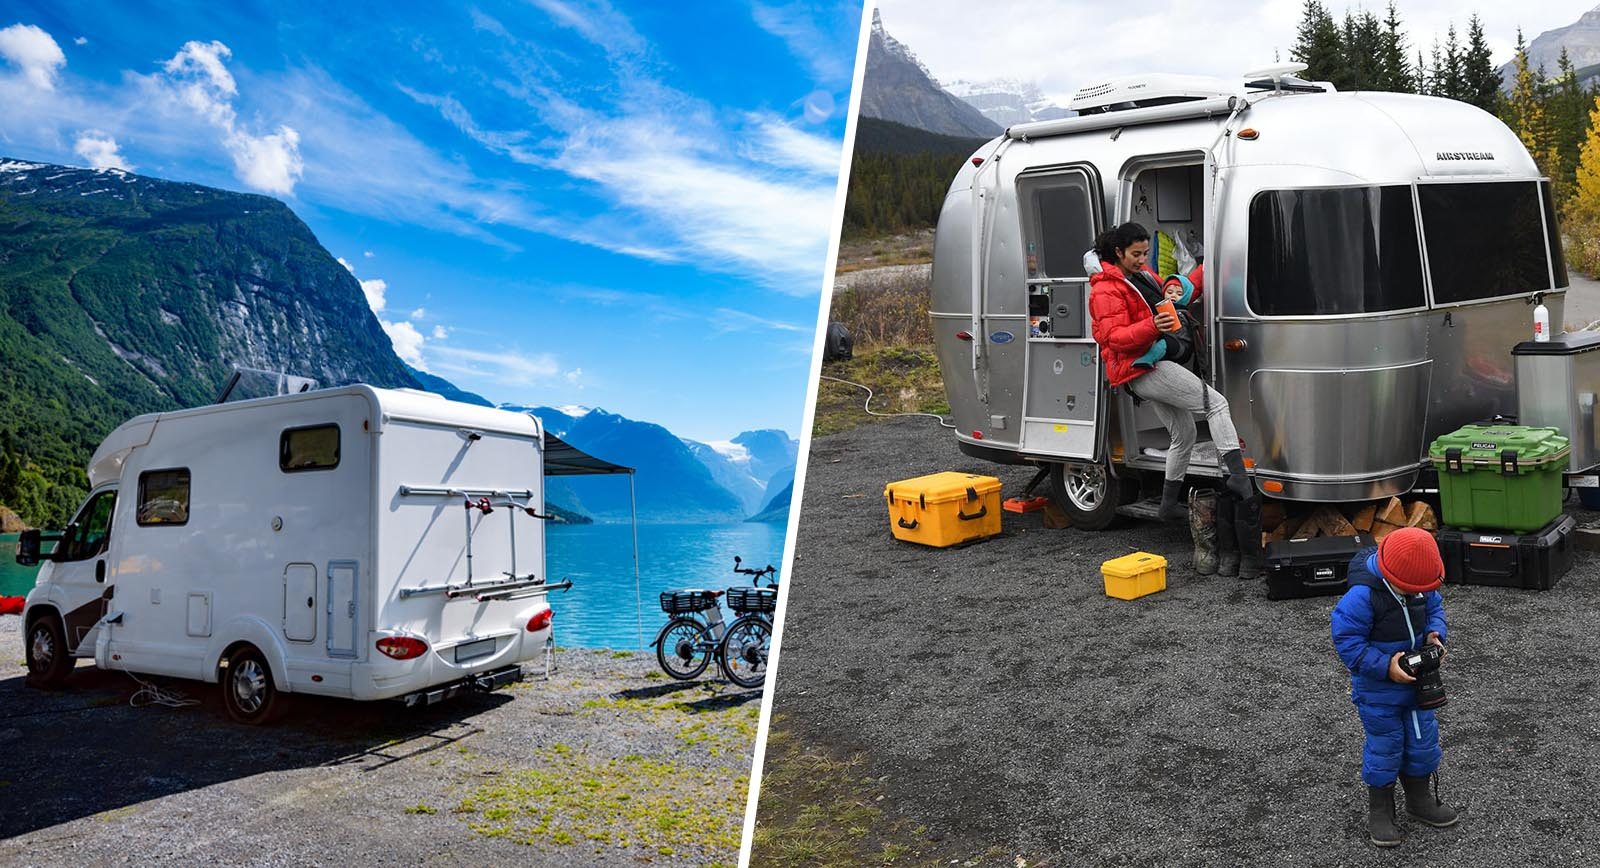 family camping boondocking rv